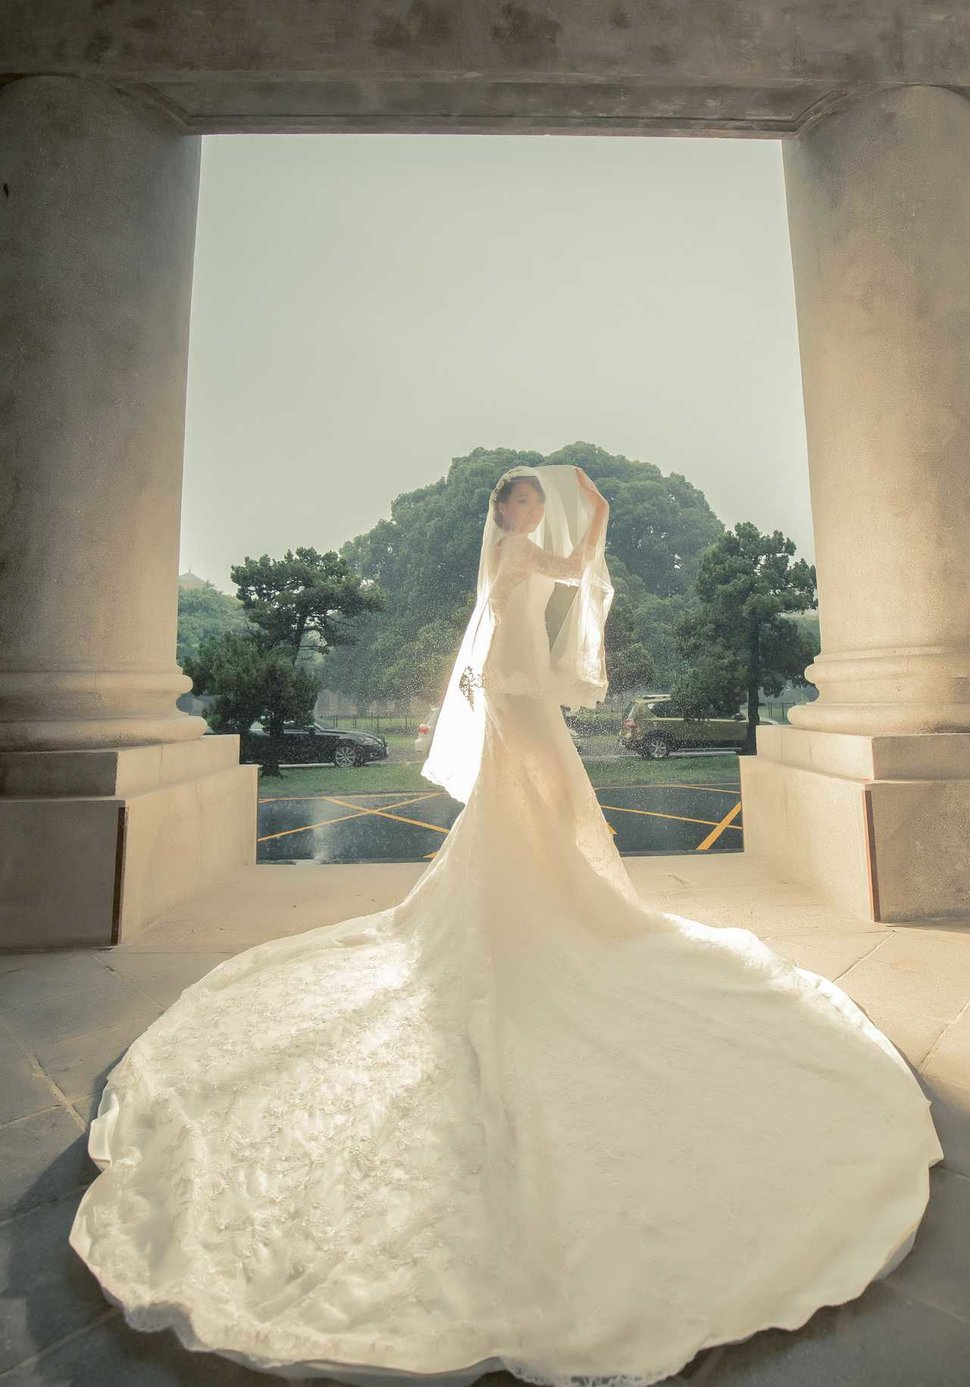 Wedding_Photo_2016_025 - 台北新秘WeiMare-新娘秘書小葳《結婚吧》